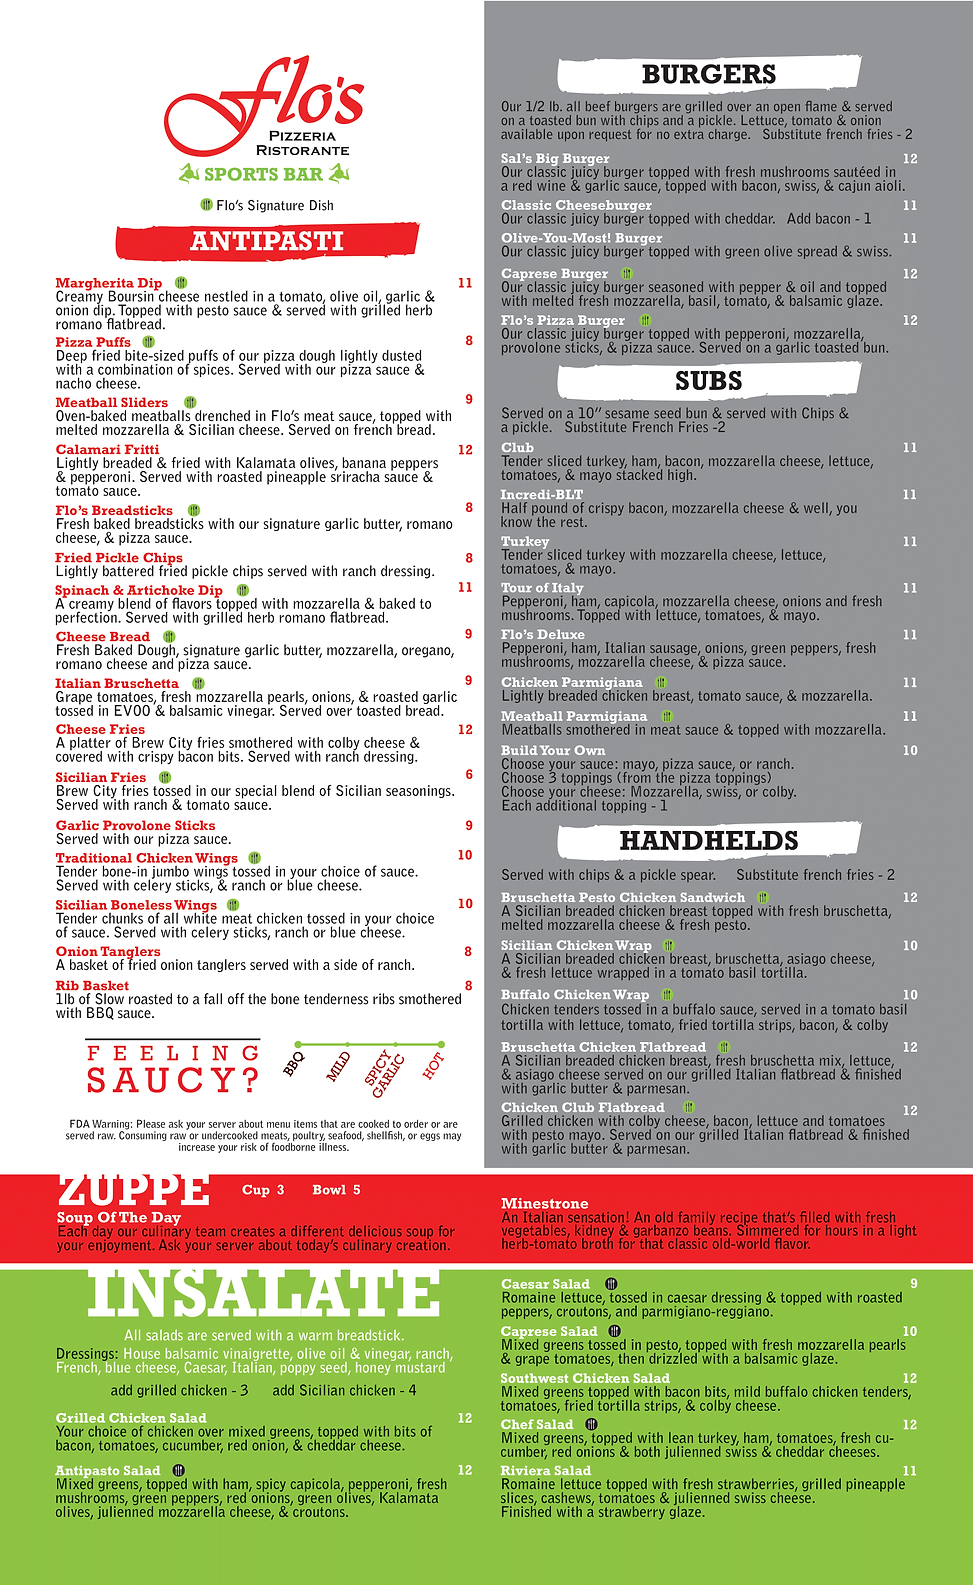 Flo's Sports Bar Menu 04.08.20-1.png